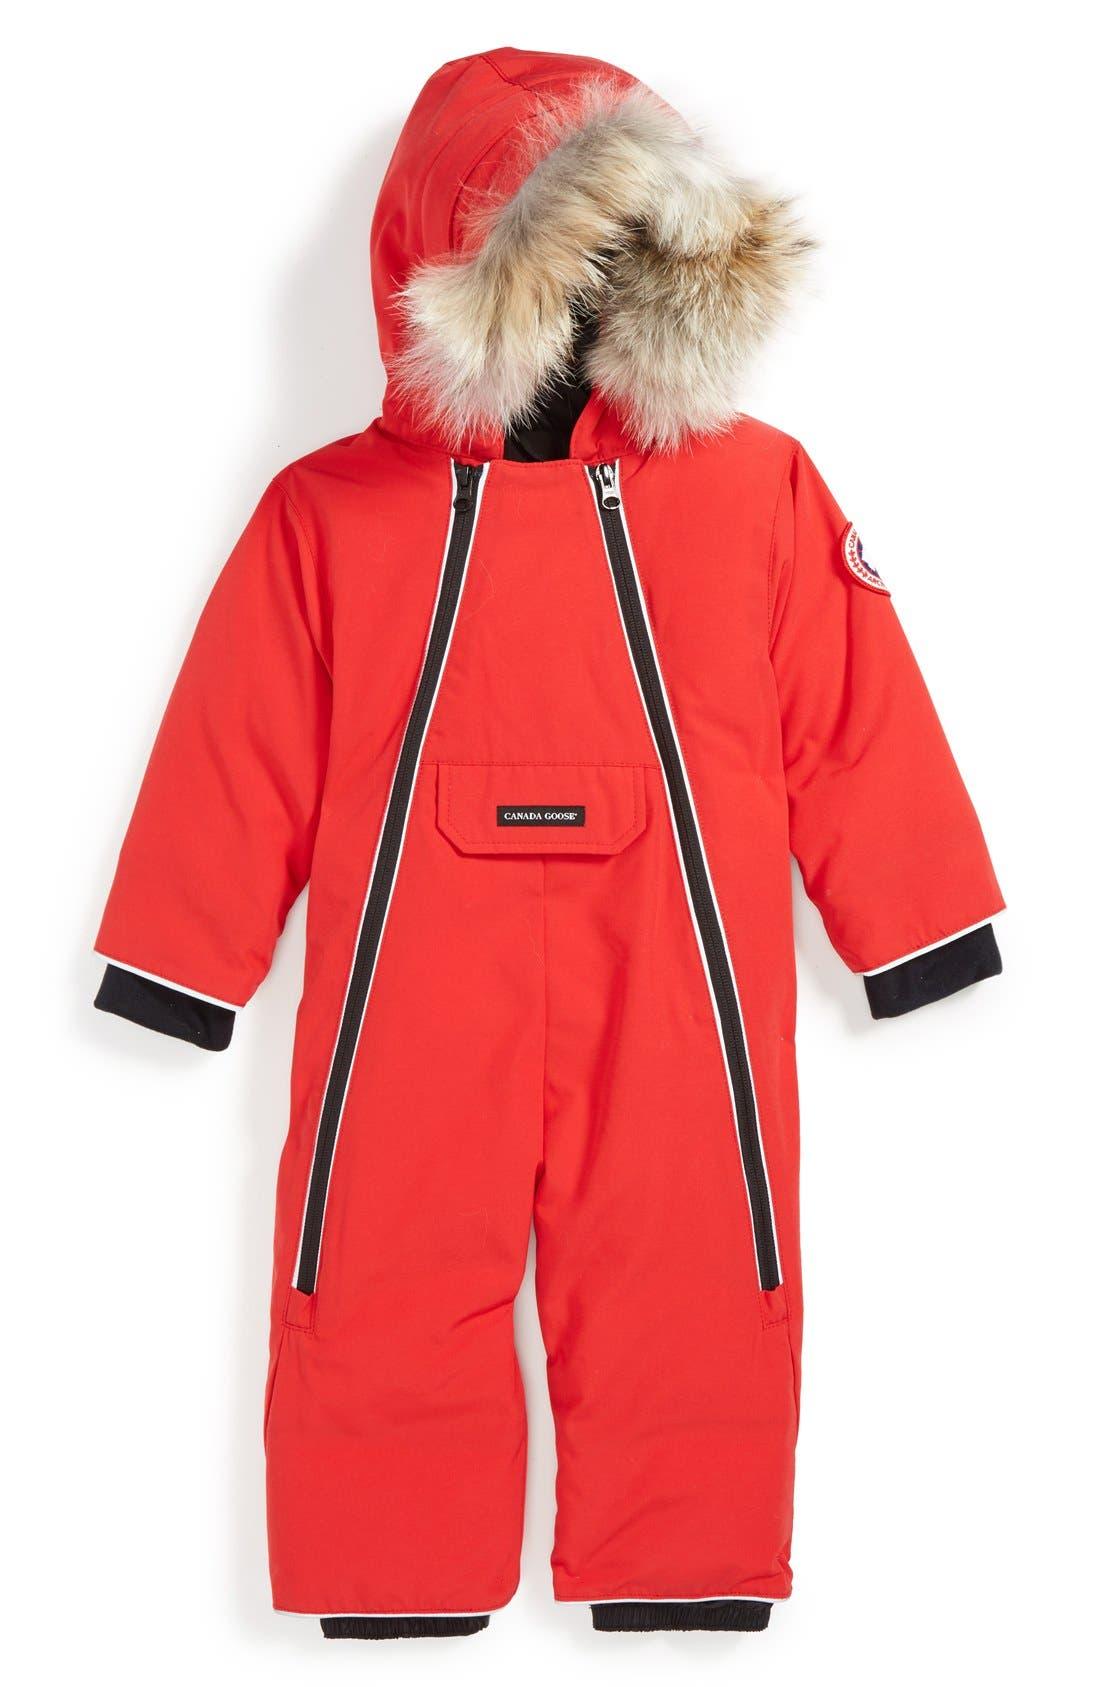 'Lamb' Down Snowsuit with Genuine Coyote Fur Trim,                             Main thumbnail 1, color,                             RED